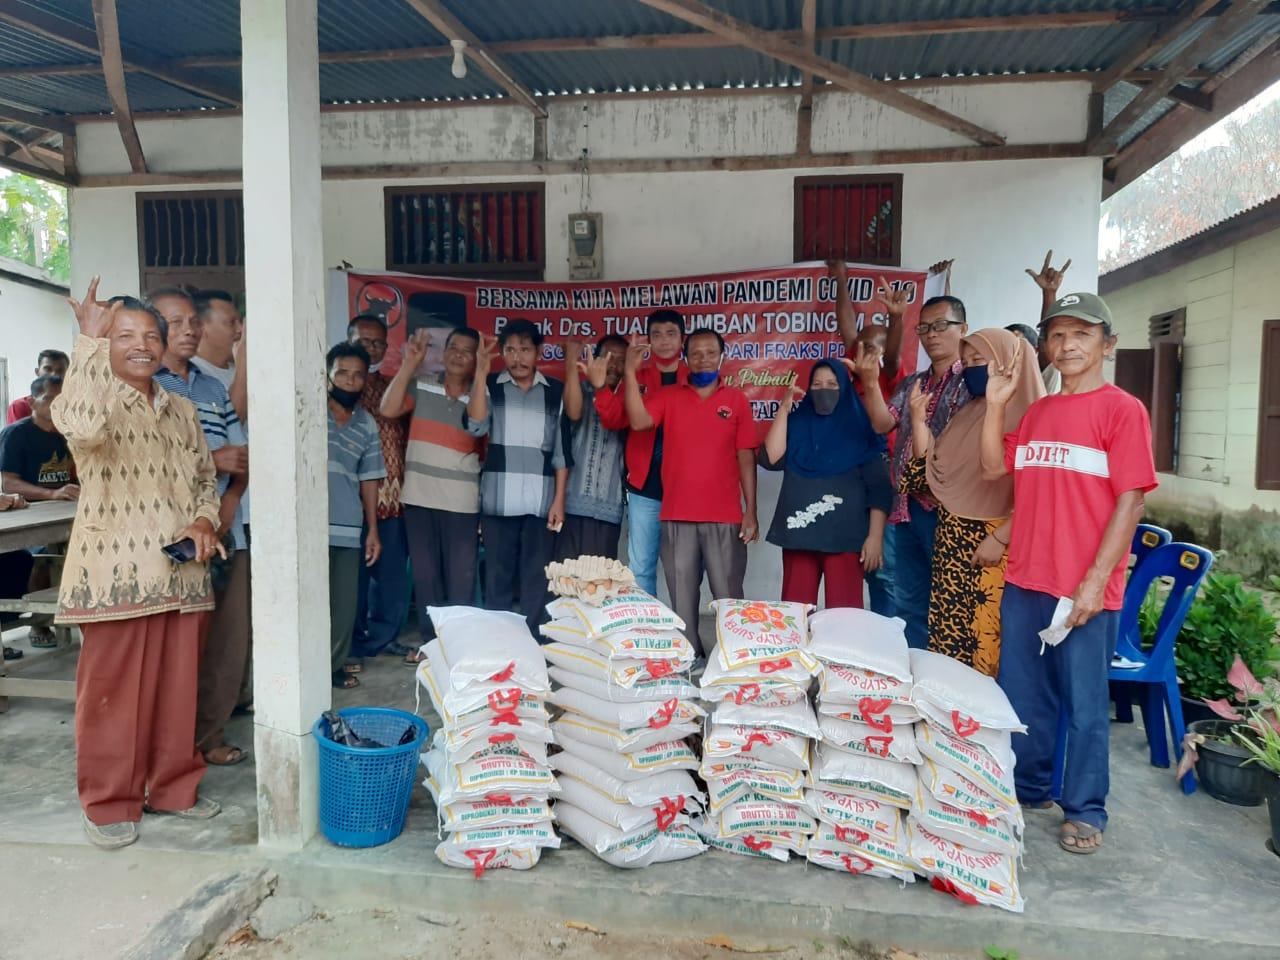 Masyarakat Tapteng saat menerima bantuan beras dari anggota DPRD Sumut, Drs Tuani Lumbantobing serta telur dari Ketua DPC PDIP Tapteng yang diserahkan pengurus partai PDIP Tapteng. Foto: istimewa